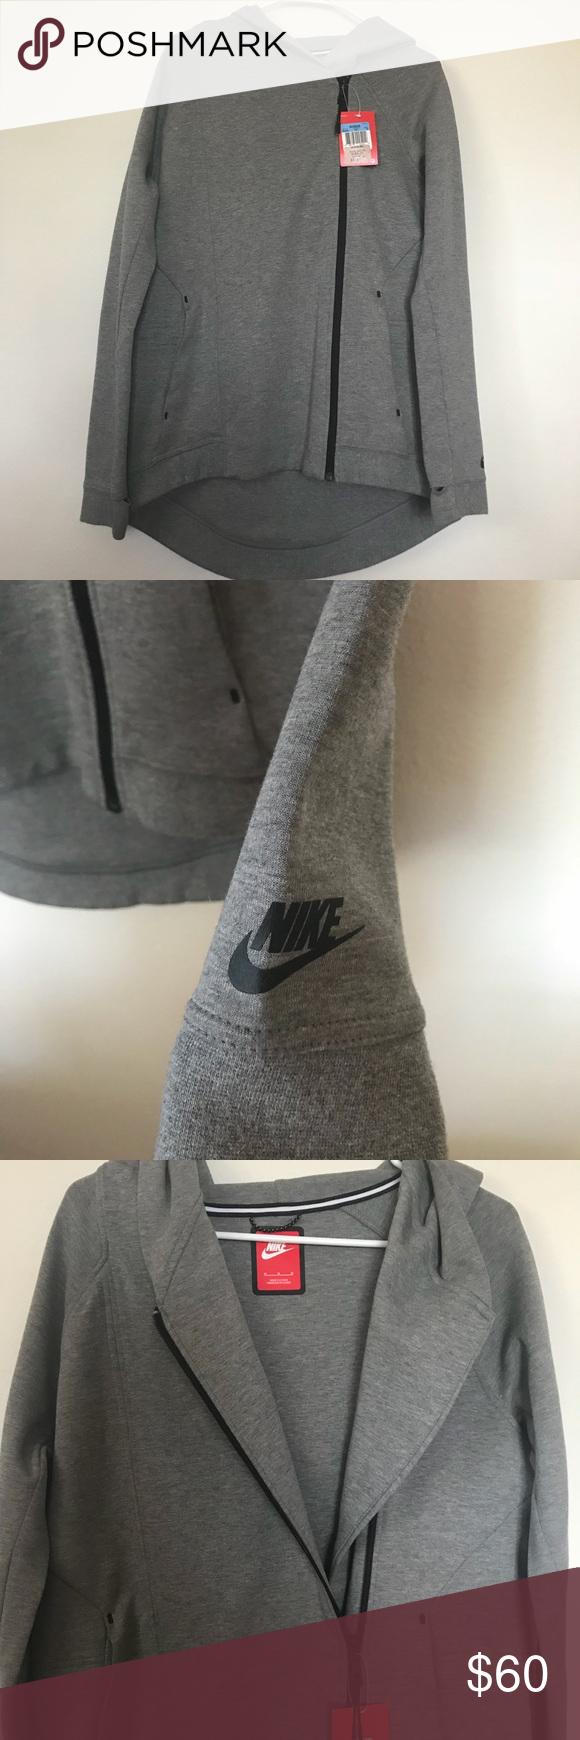 e30476a7b290 Women s M Nike Tech Fleece Oversized Jacket New Women s Size Medium Nike  Tech Fleece Jacket -